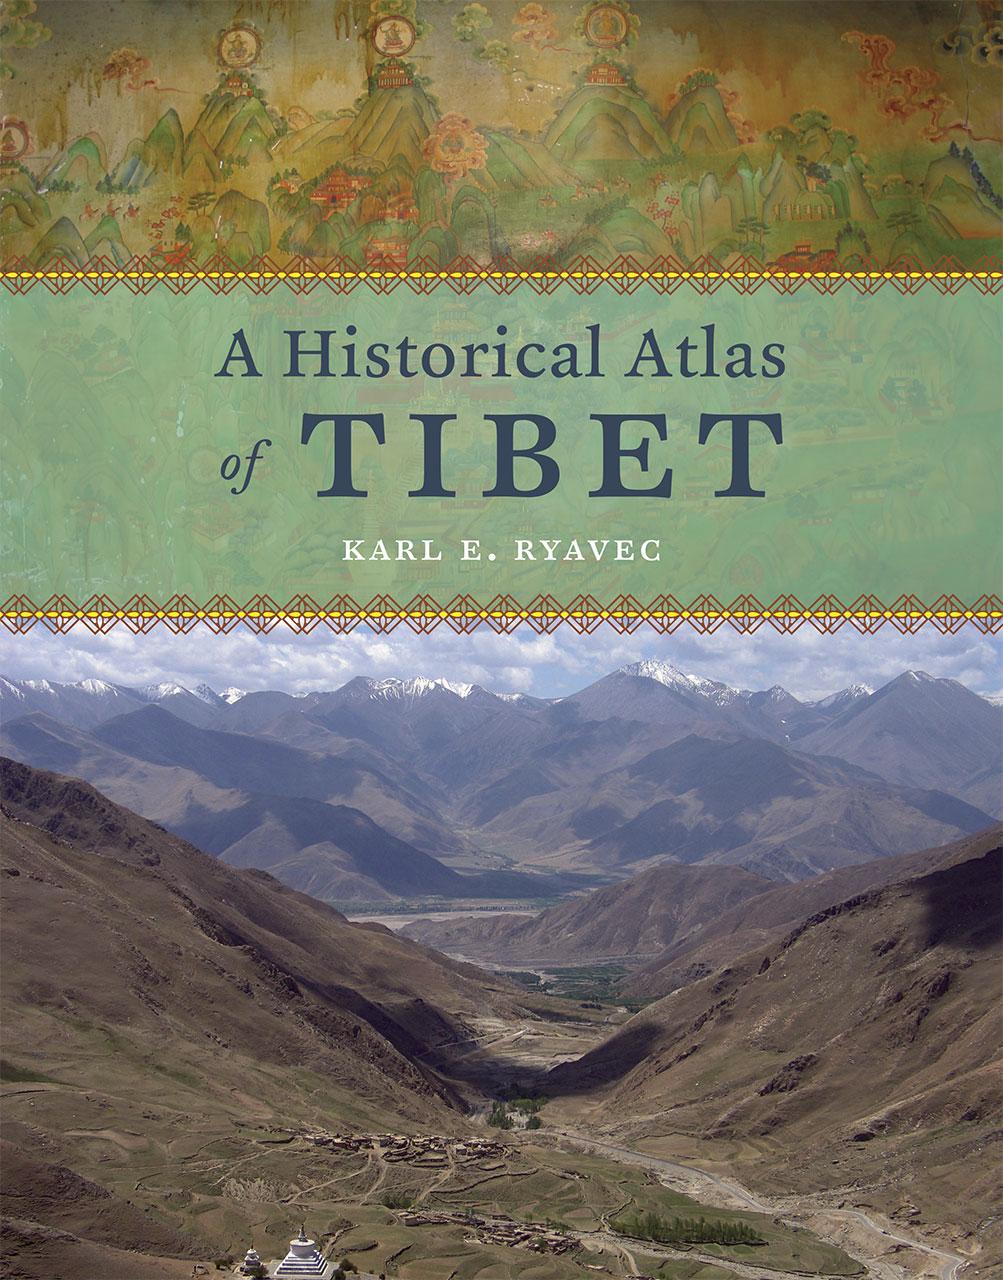 A historical atlas of Tibet / Karl E. Ryavec